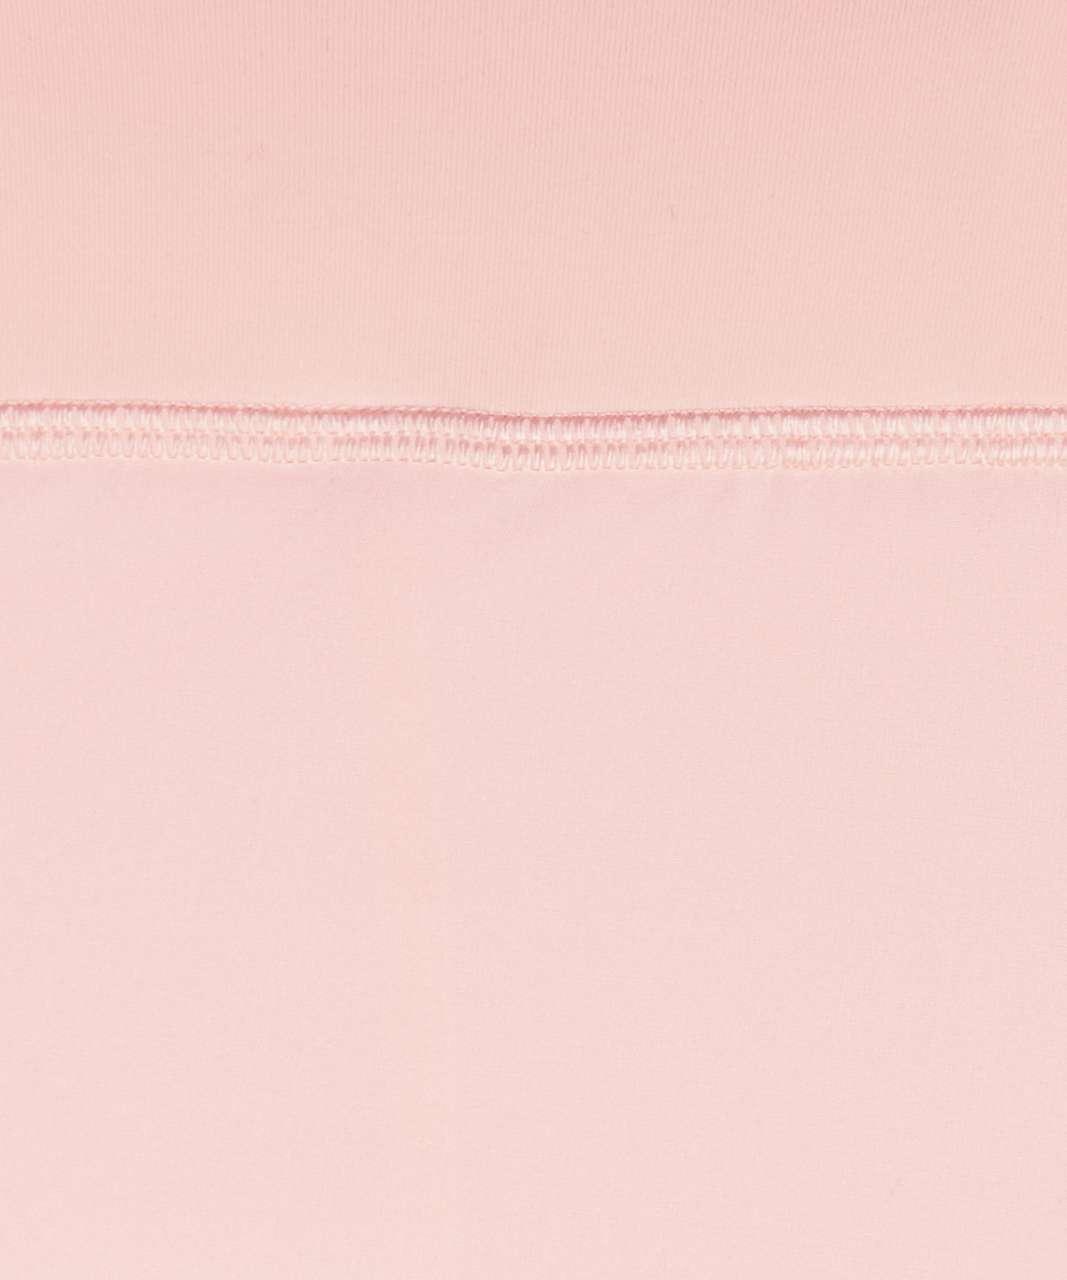 "Lululemon Pace Rival Skirt *Extra Long 17"" - Butter Pink"